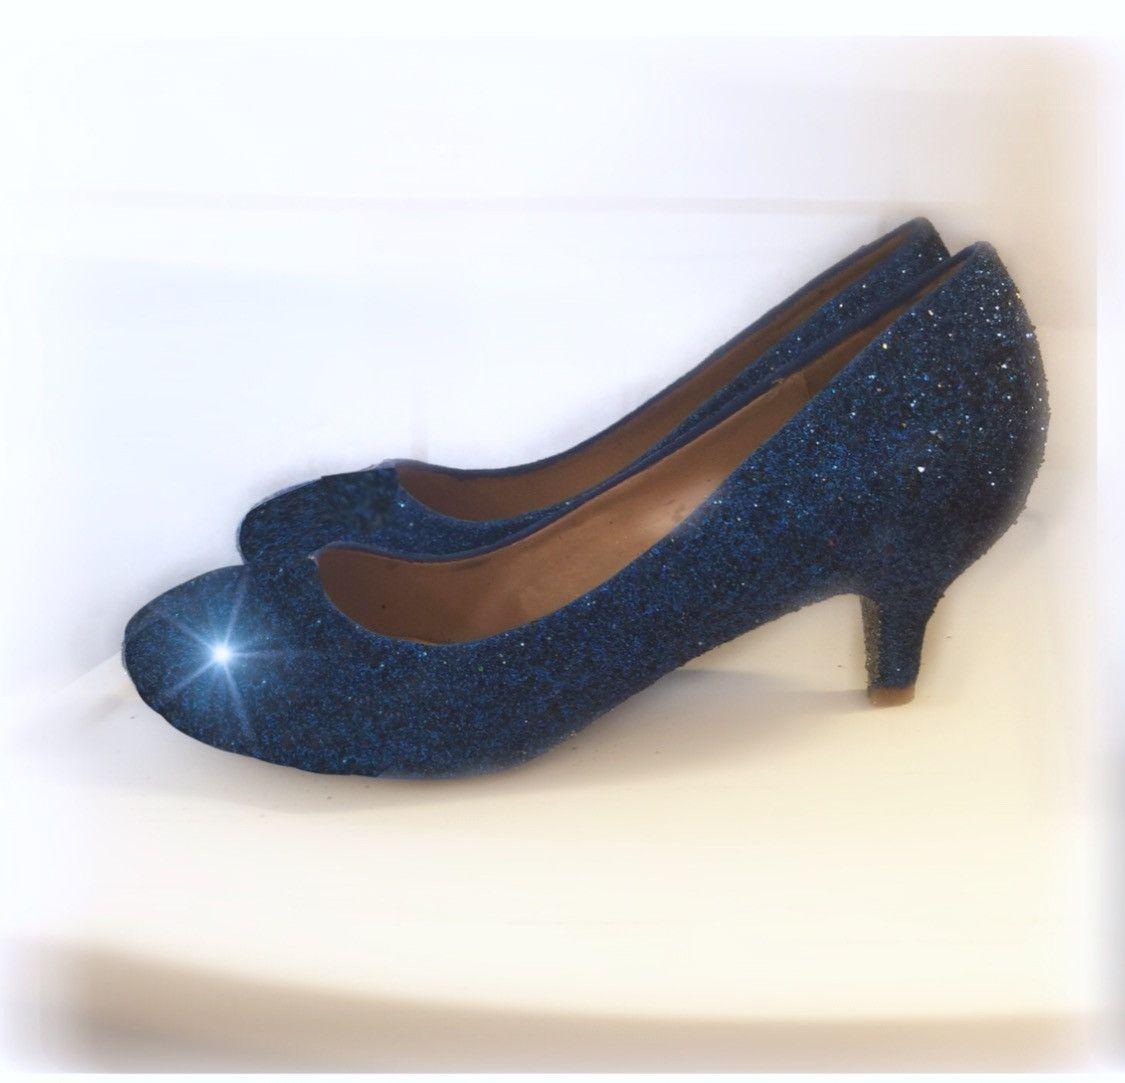 Women S Sparkly Navy Blue Glitter Pumps Kitten Heels Shoes Wedding Bride Prom Sweet 16 Kitten Heel Shoes Wedding Shoes Low Heel Blue Wedding Shoes Low Heel